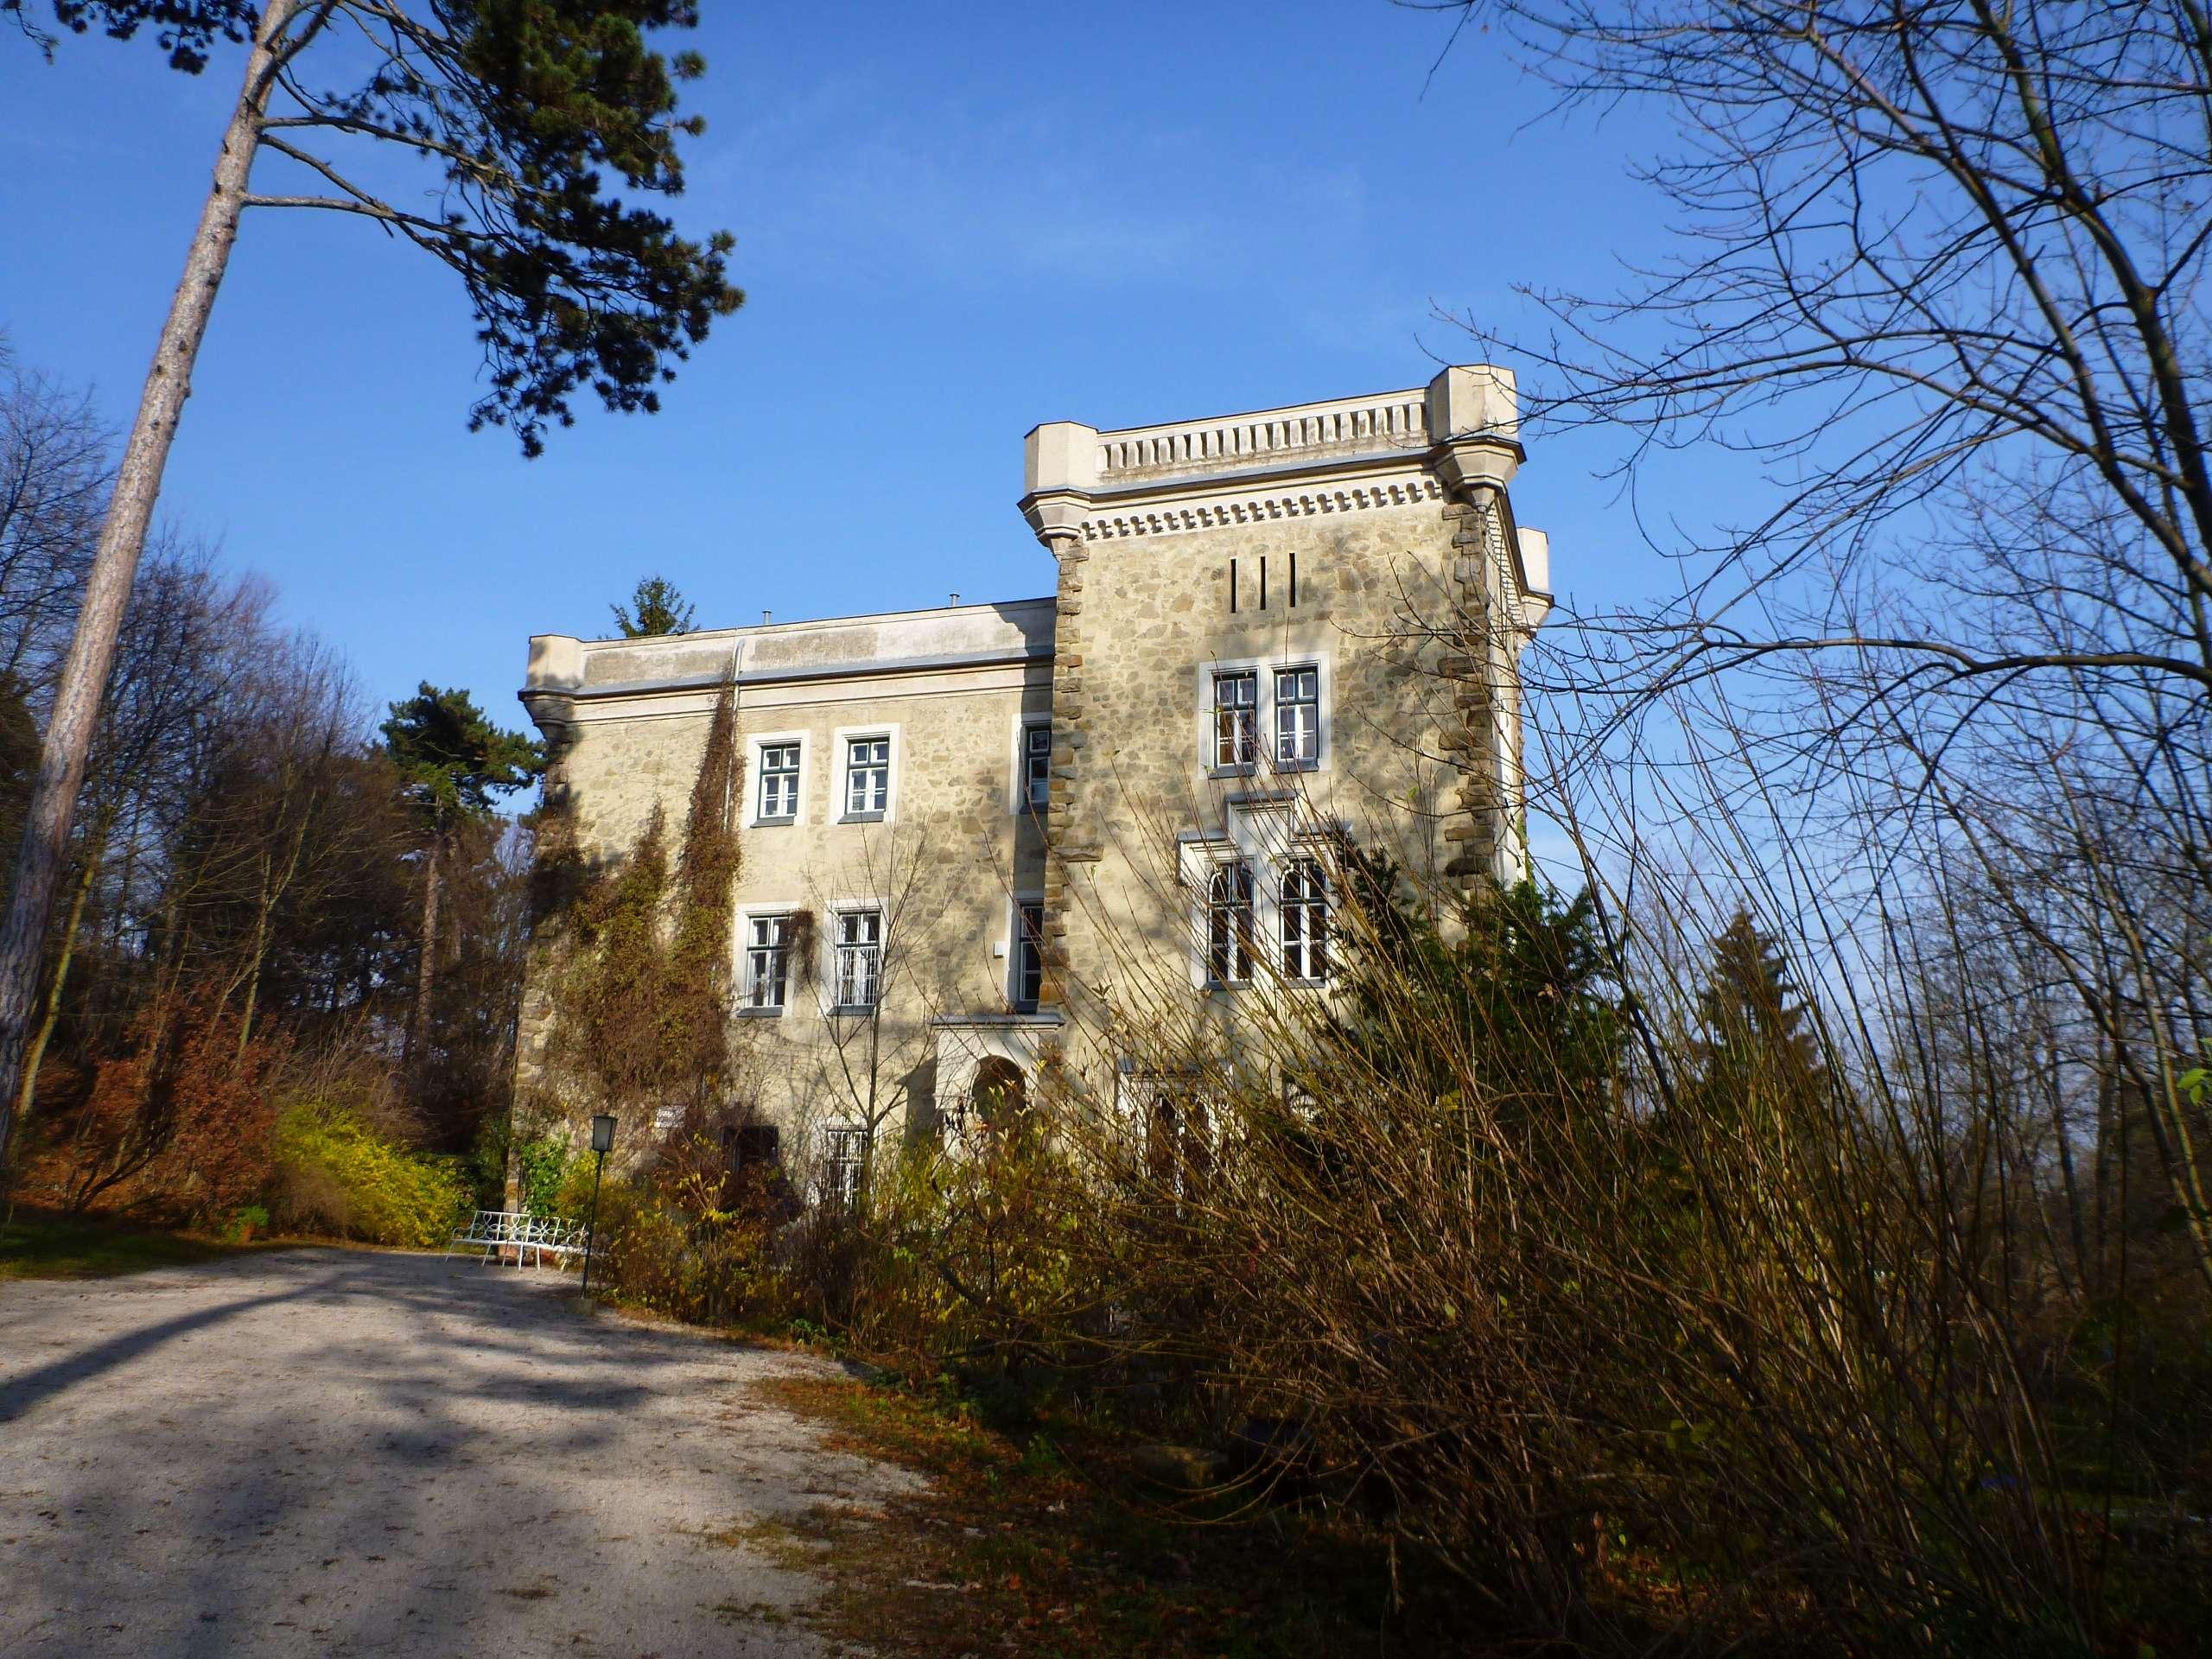 Mali dvorac